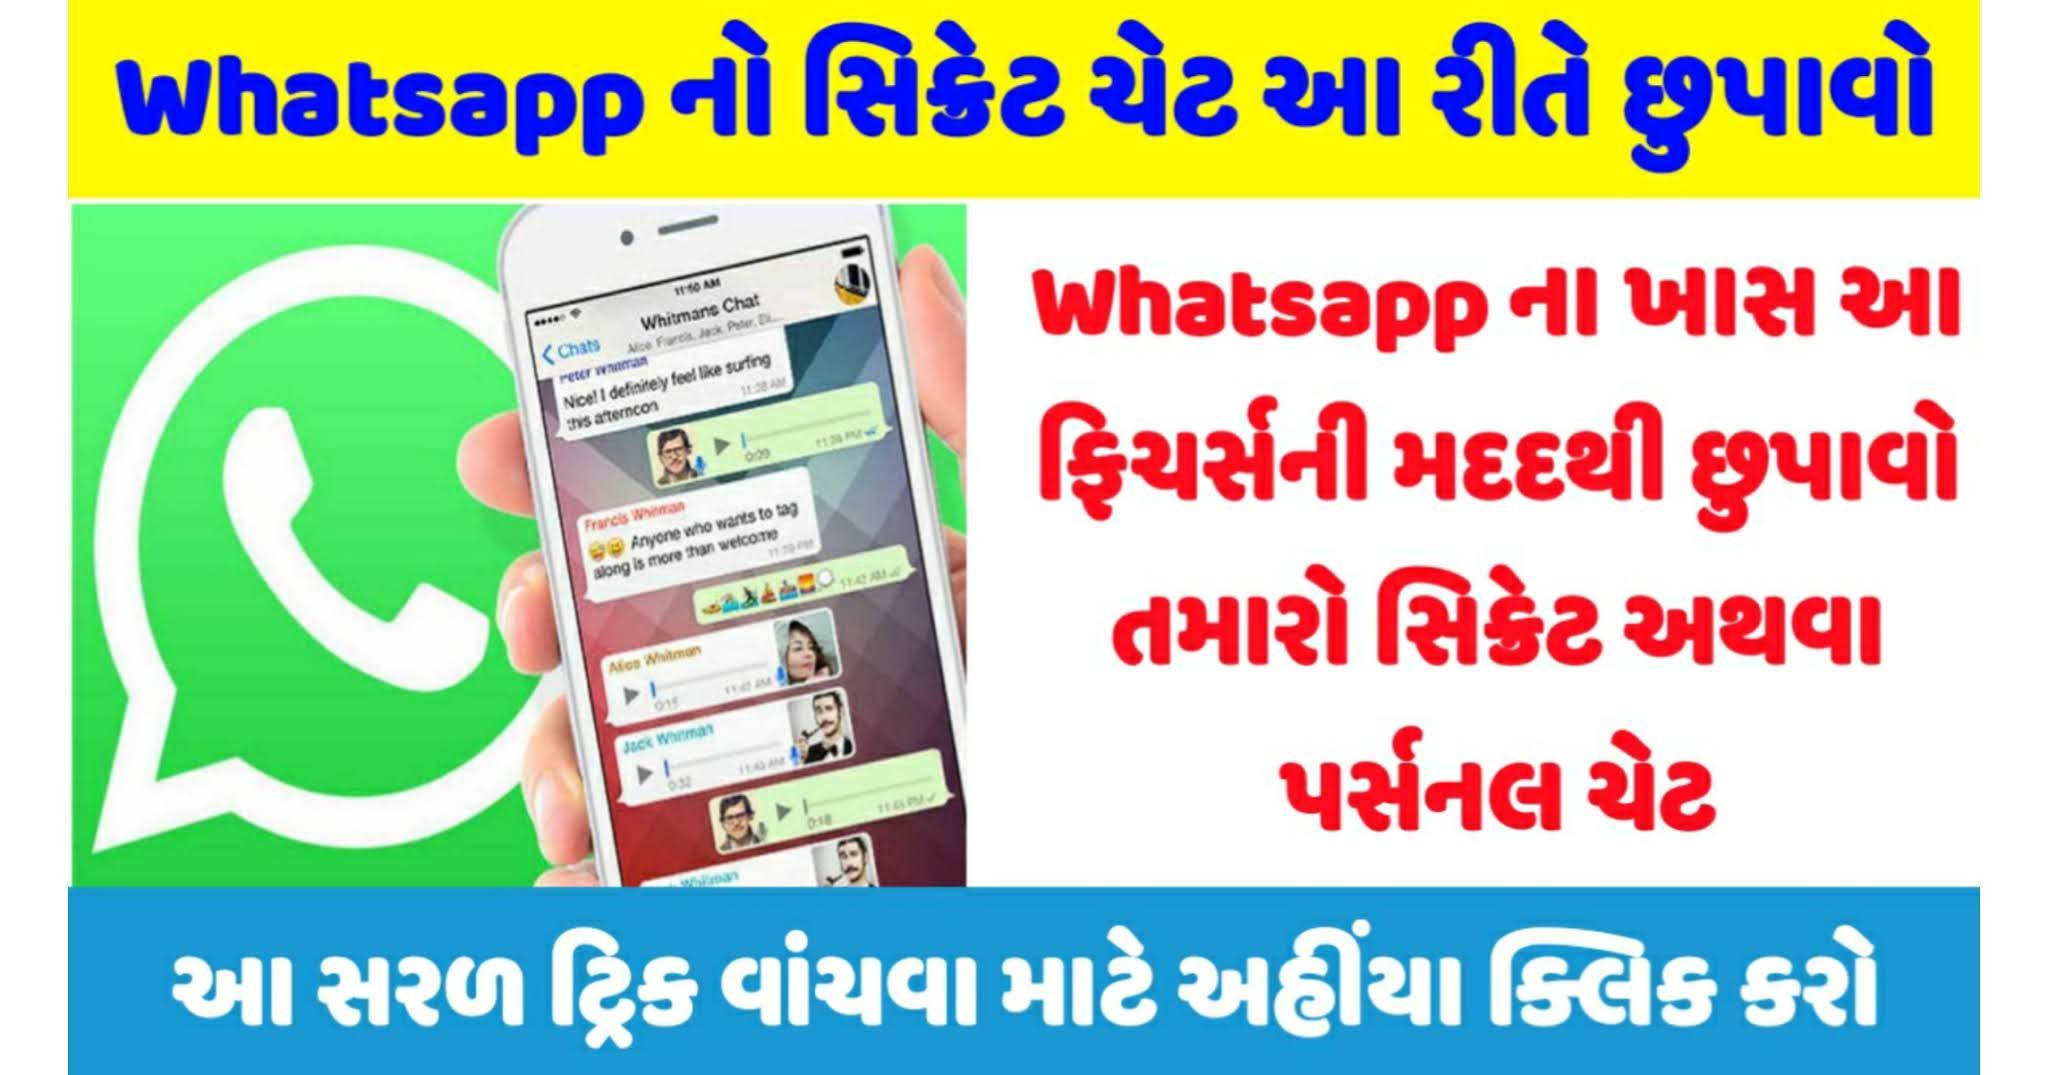 How To Hide Whatsapp Secret Chats